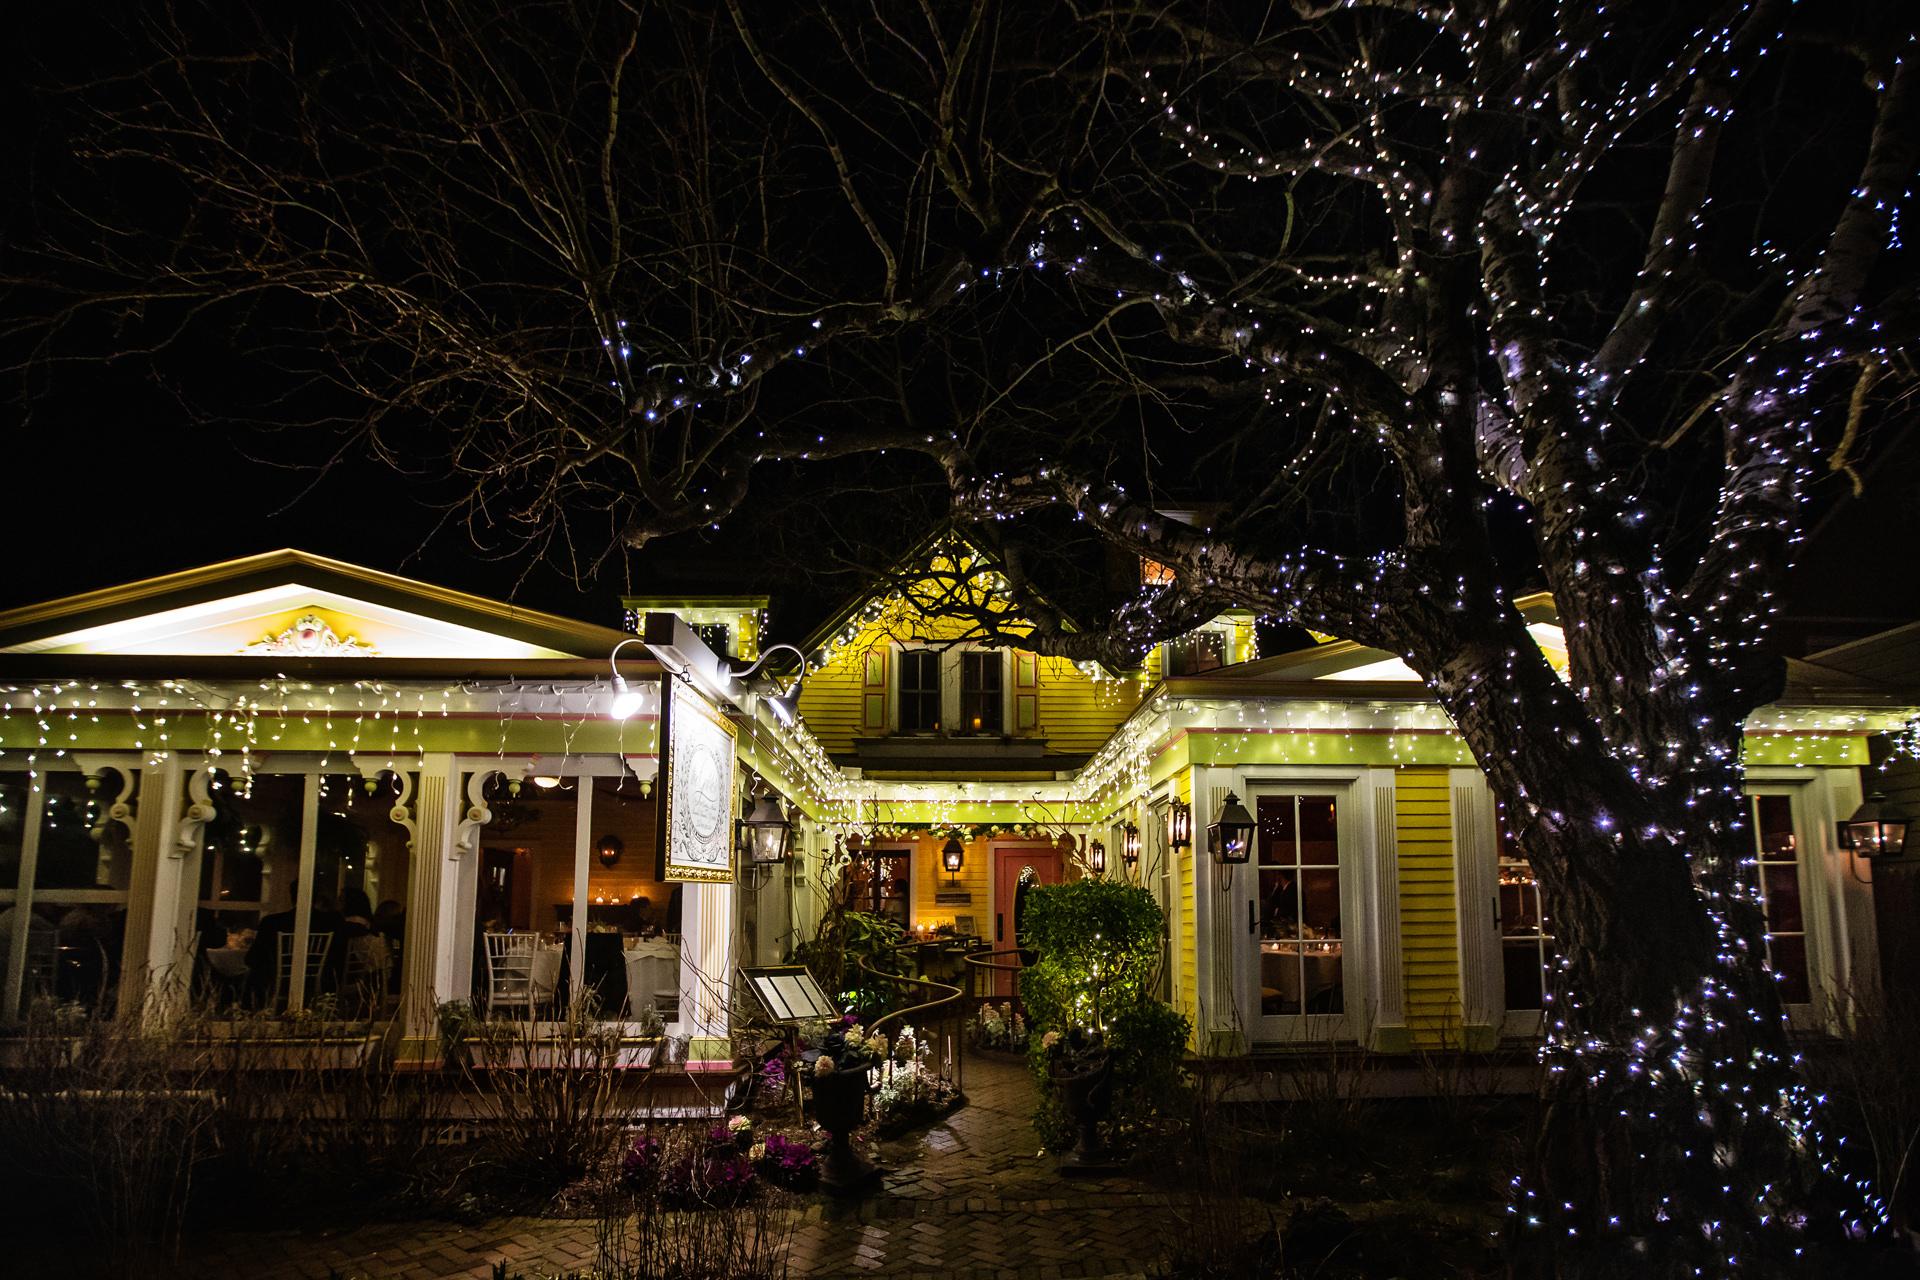 Photo: Gables Inn, Beach Haven on Long Beach Island | Night shot of the Victorian New Jersey Inn